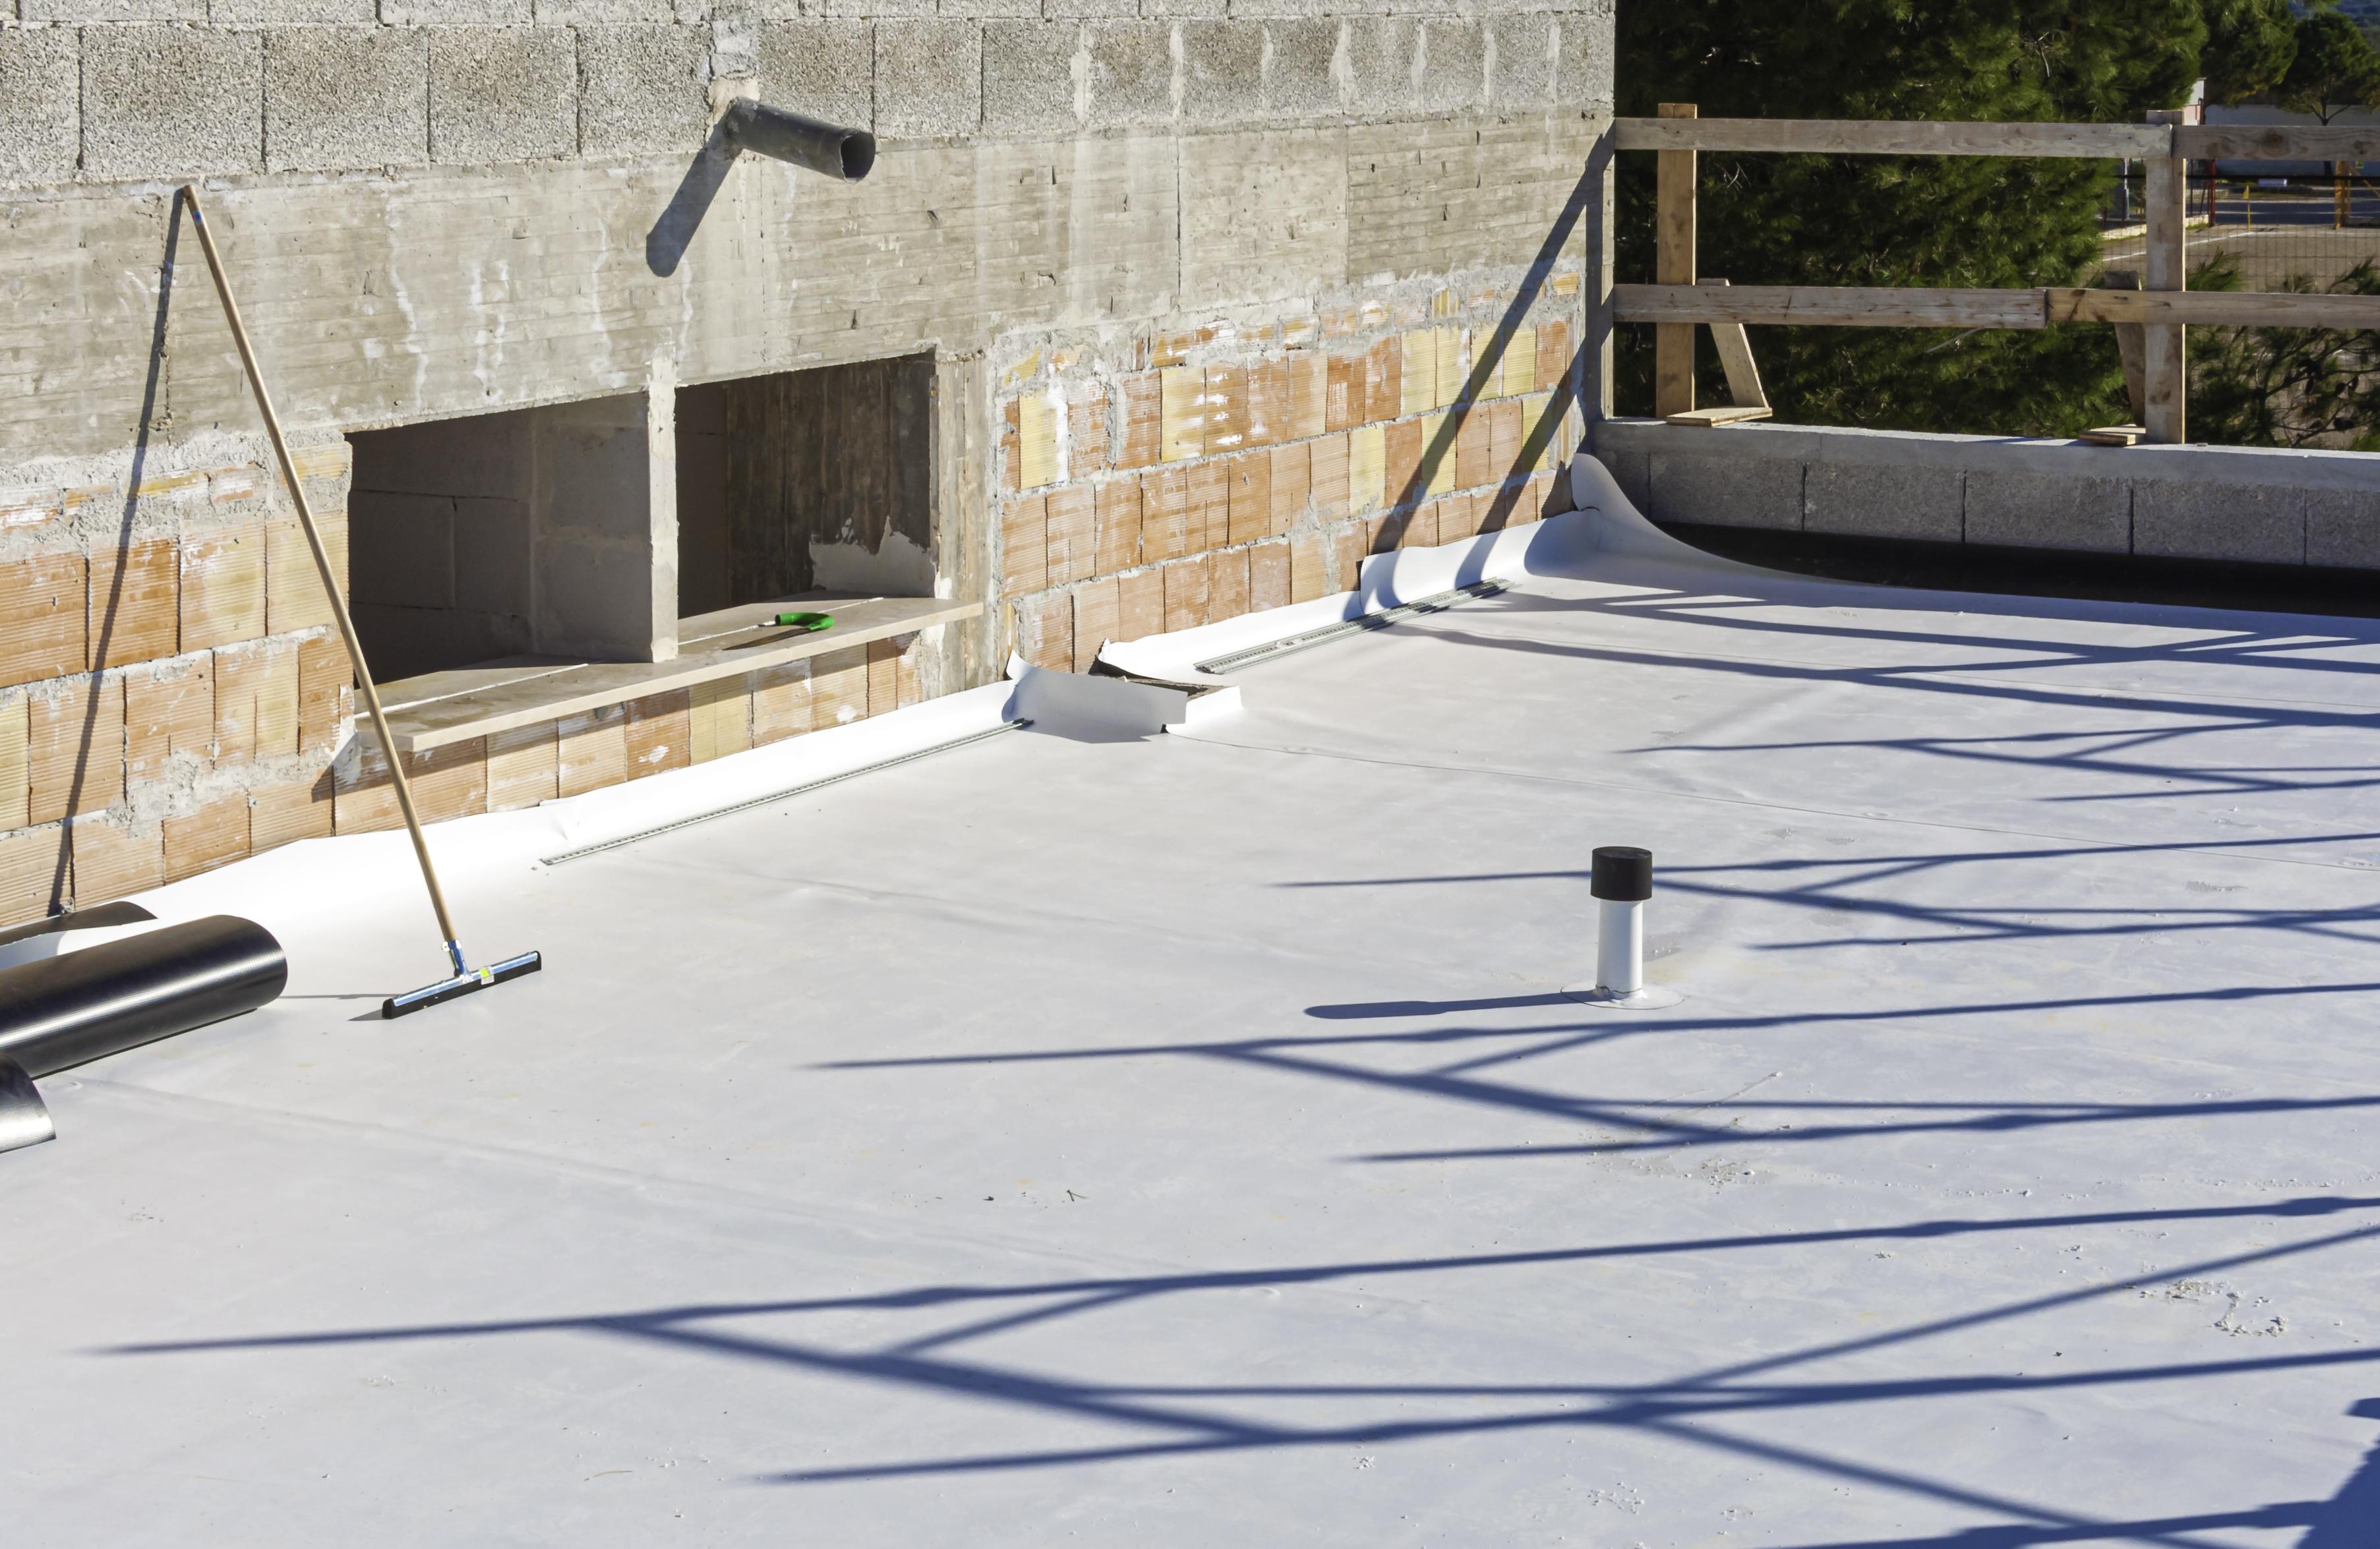 Tredegar Construction installs TPO roofs in the Richmond metro area